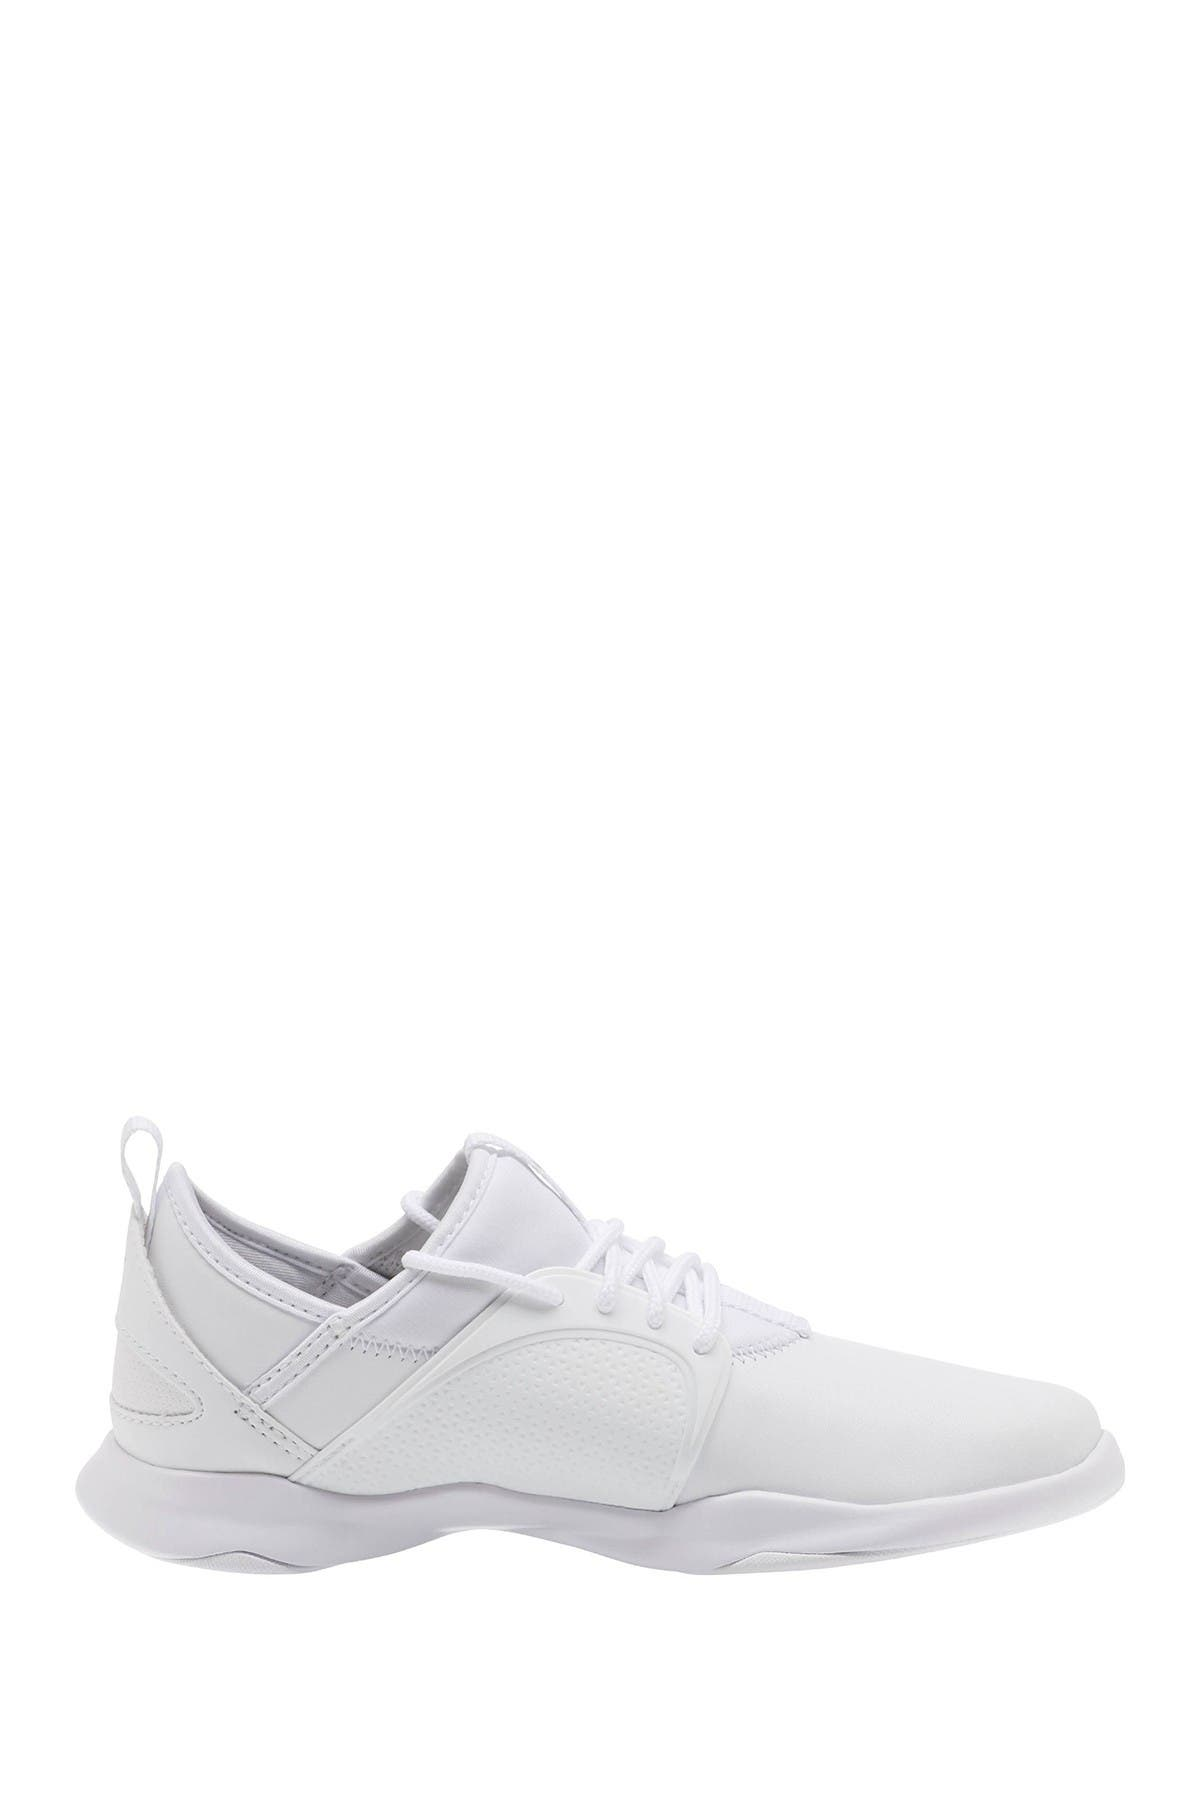 PUMA | Dare Lace Sneaker | Nordstrom Rack